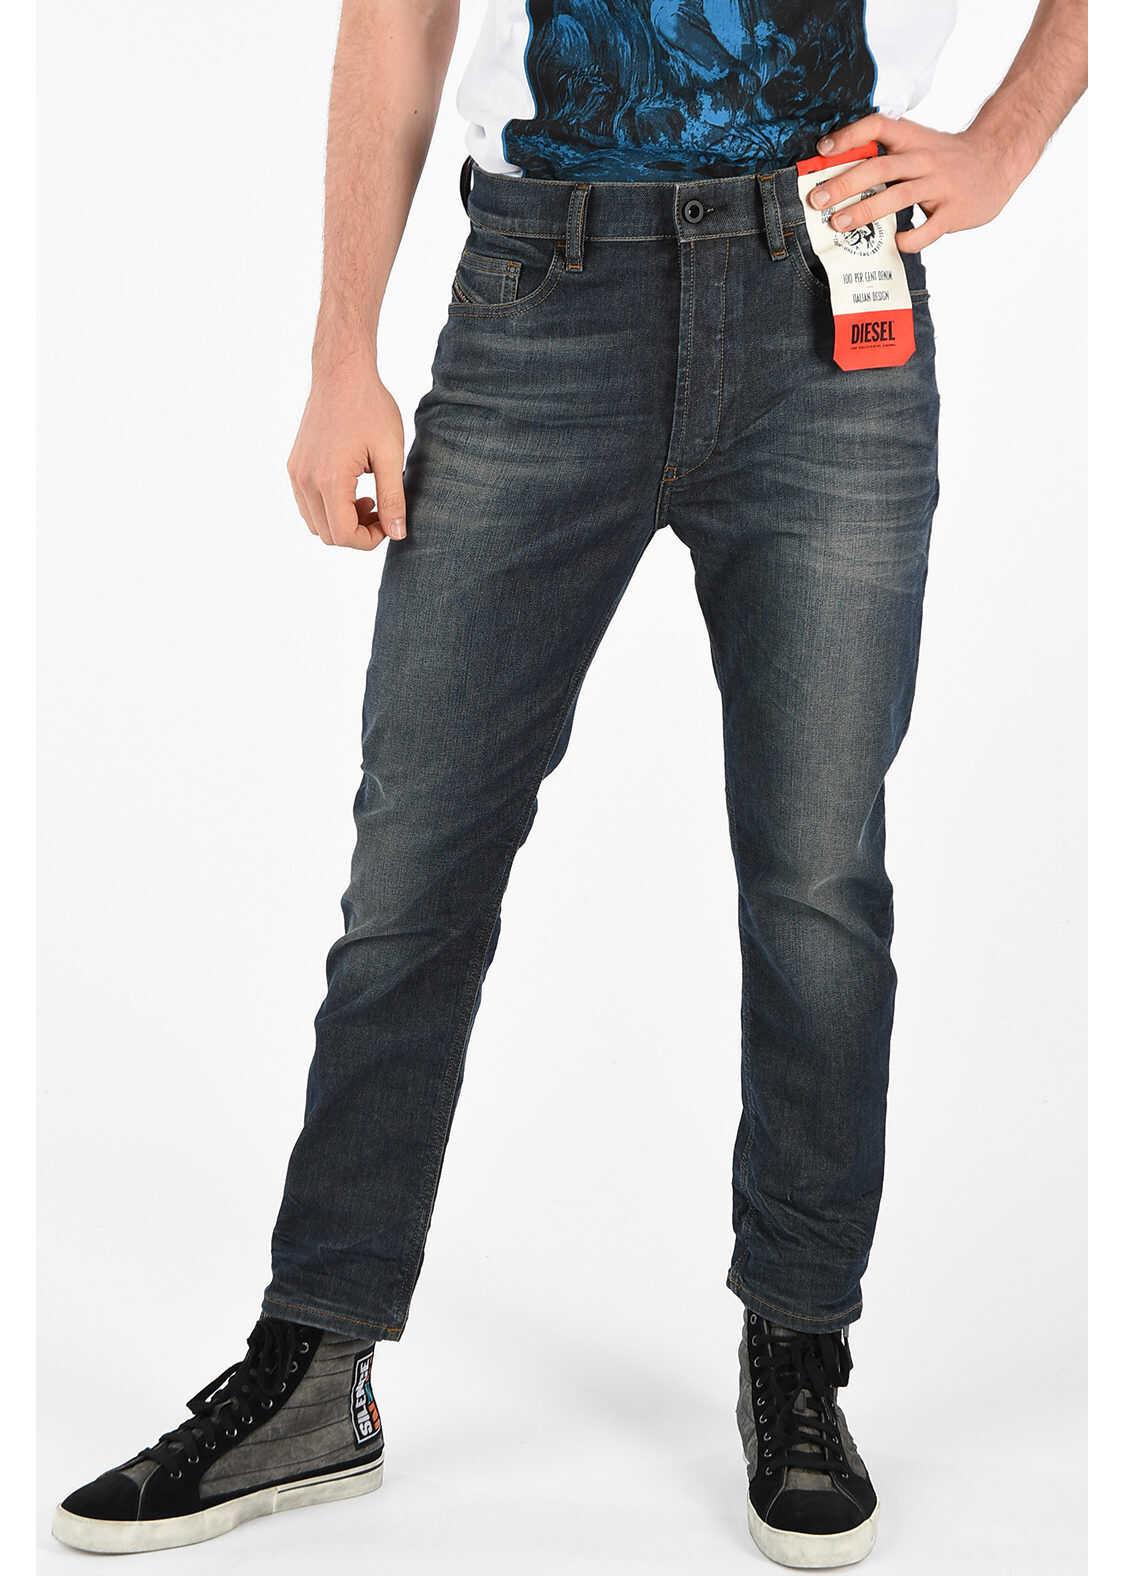 Diesel 17cm Stretch Denim D-EETAR L.32 Jeans BLACK